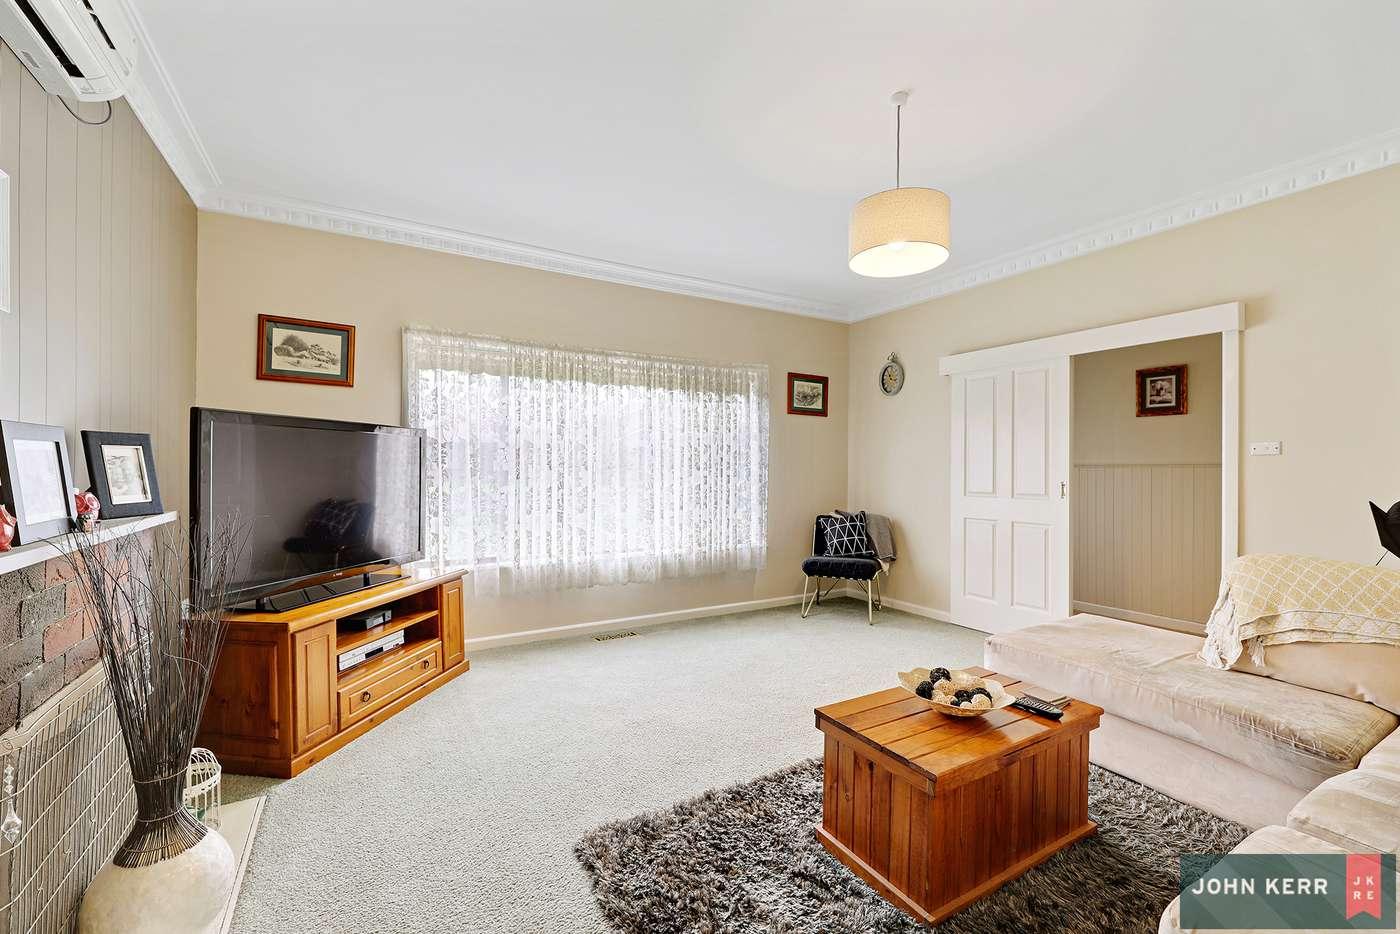 Main view of Homely house listing, 20 Kitchener Street, Trafalgar VIC 3824